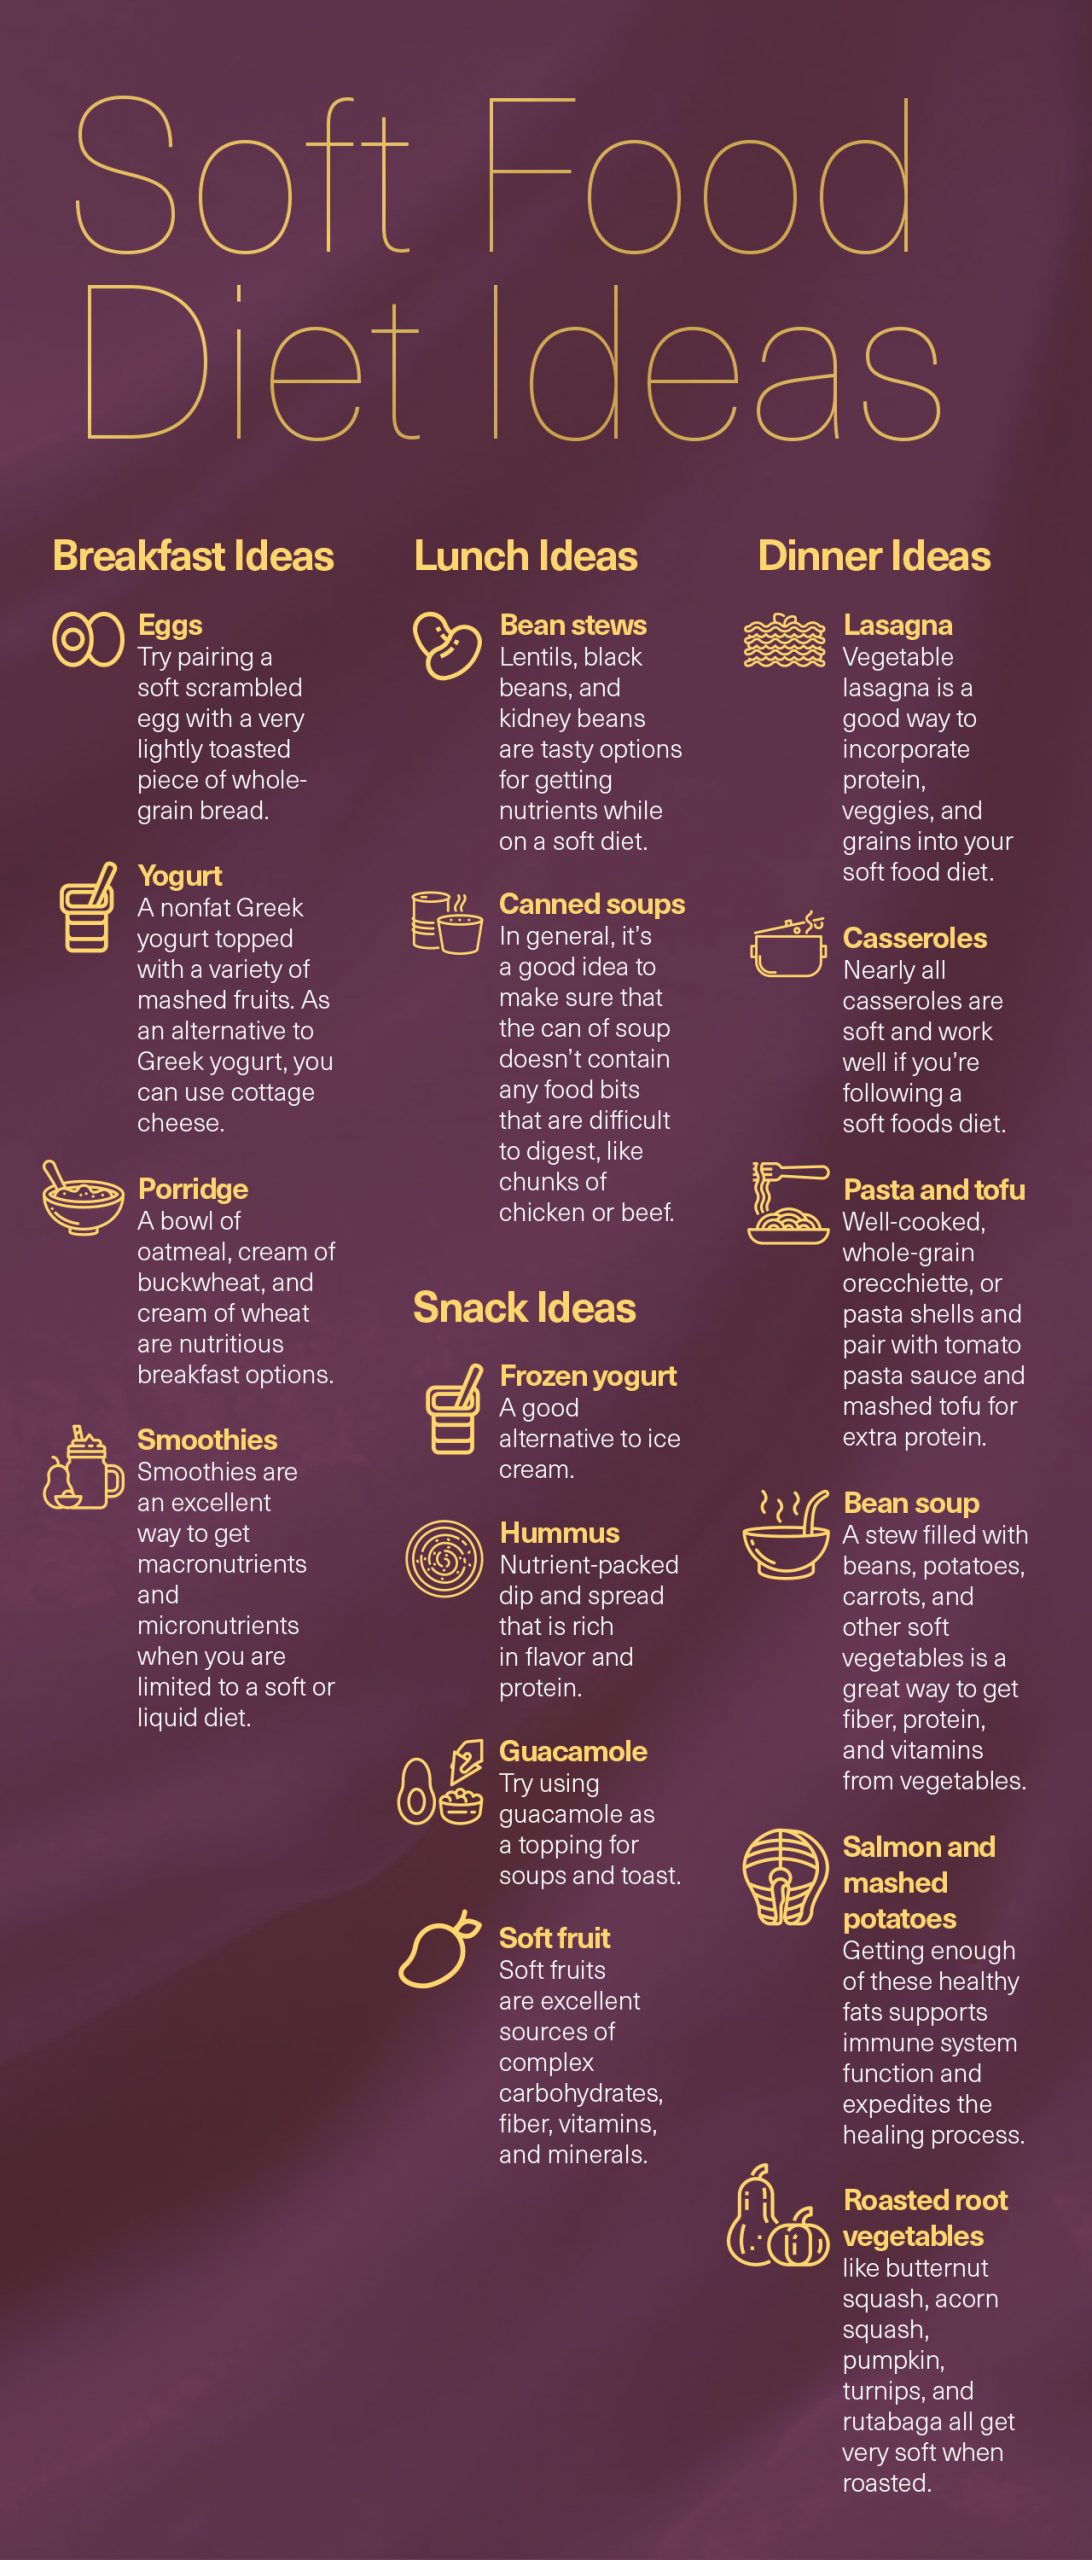 Soft Food Diet Ideas